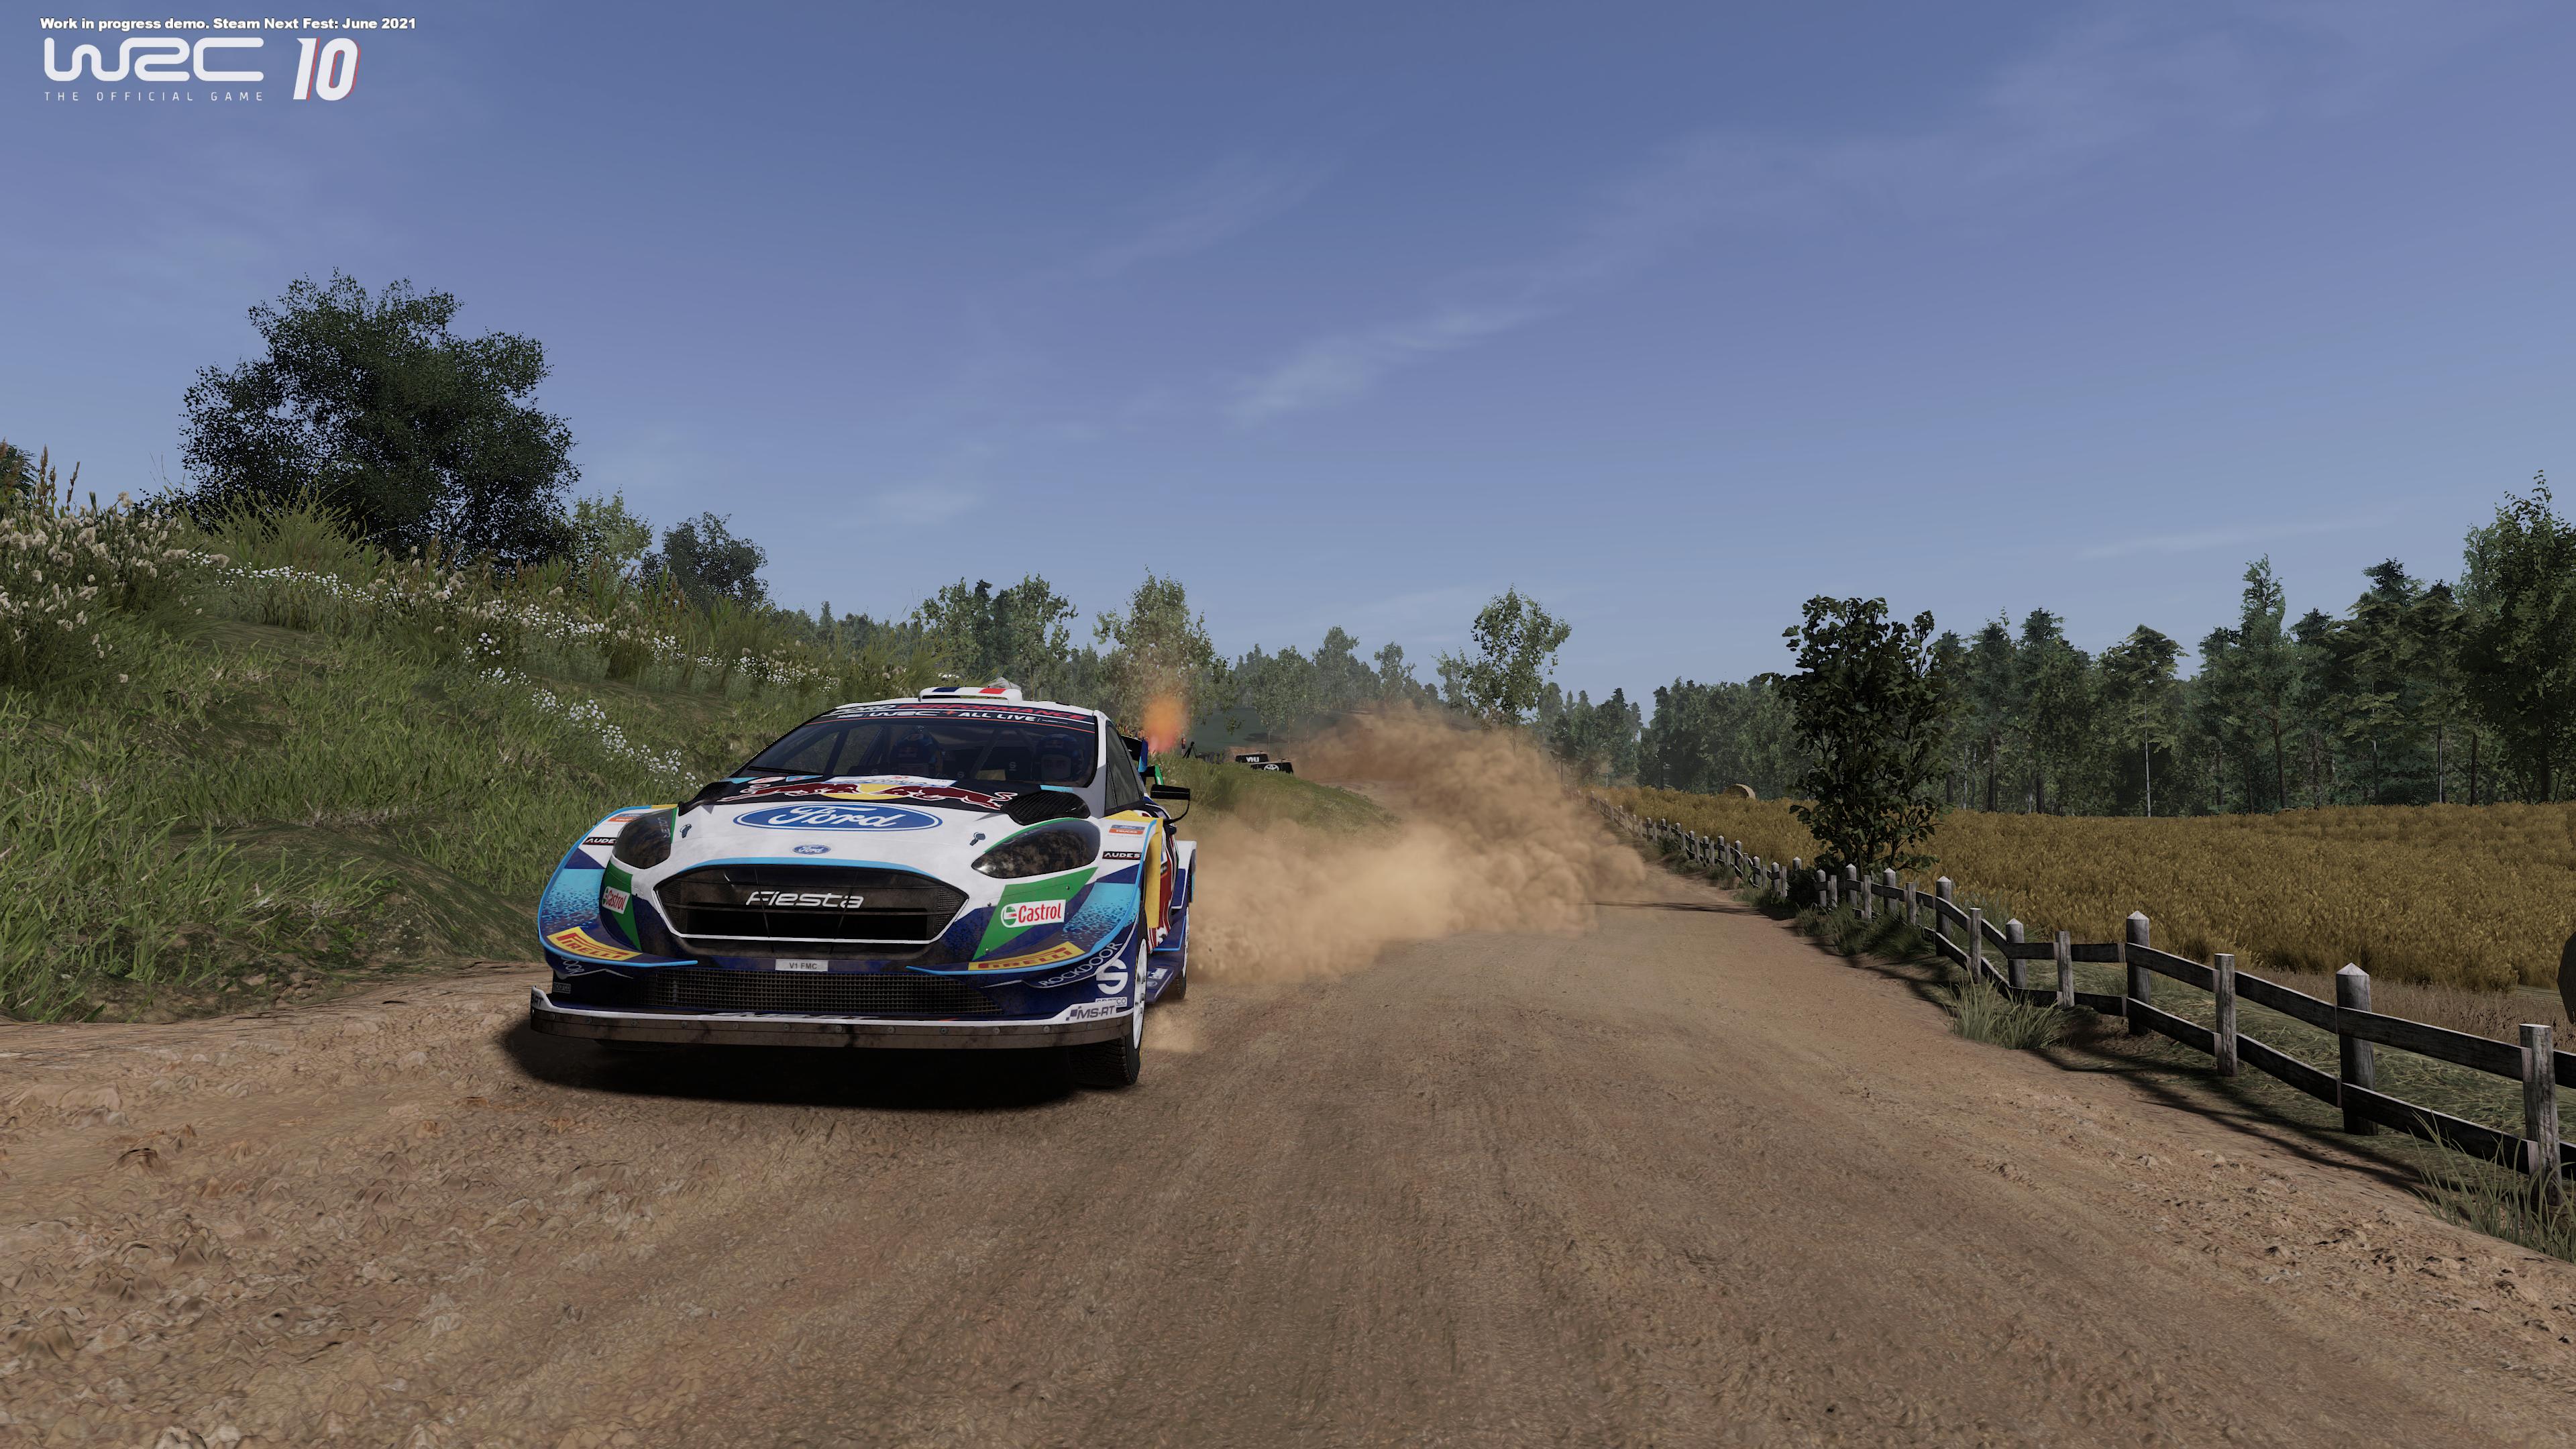 Wrc 10 Fia World Rally Championship Demo Screenshot 2021.06.12 - 13.39.40.08